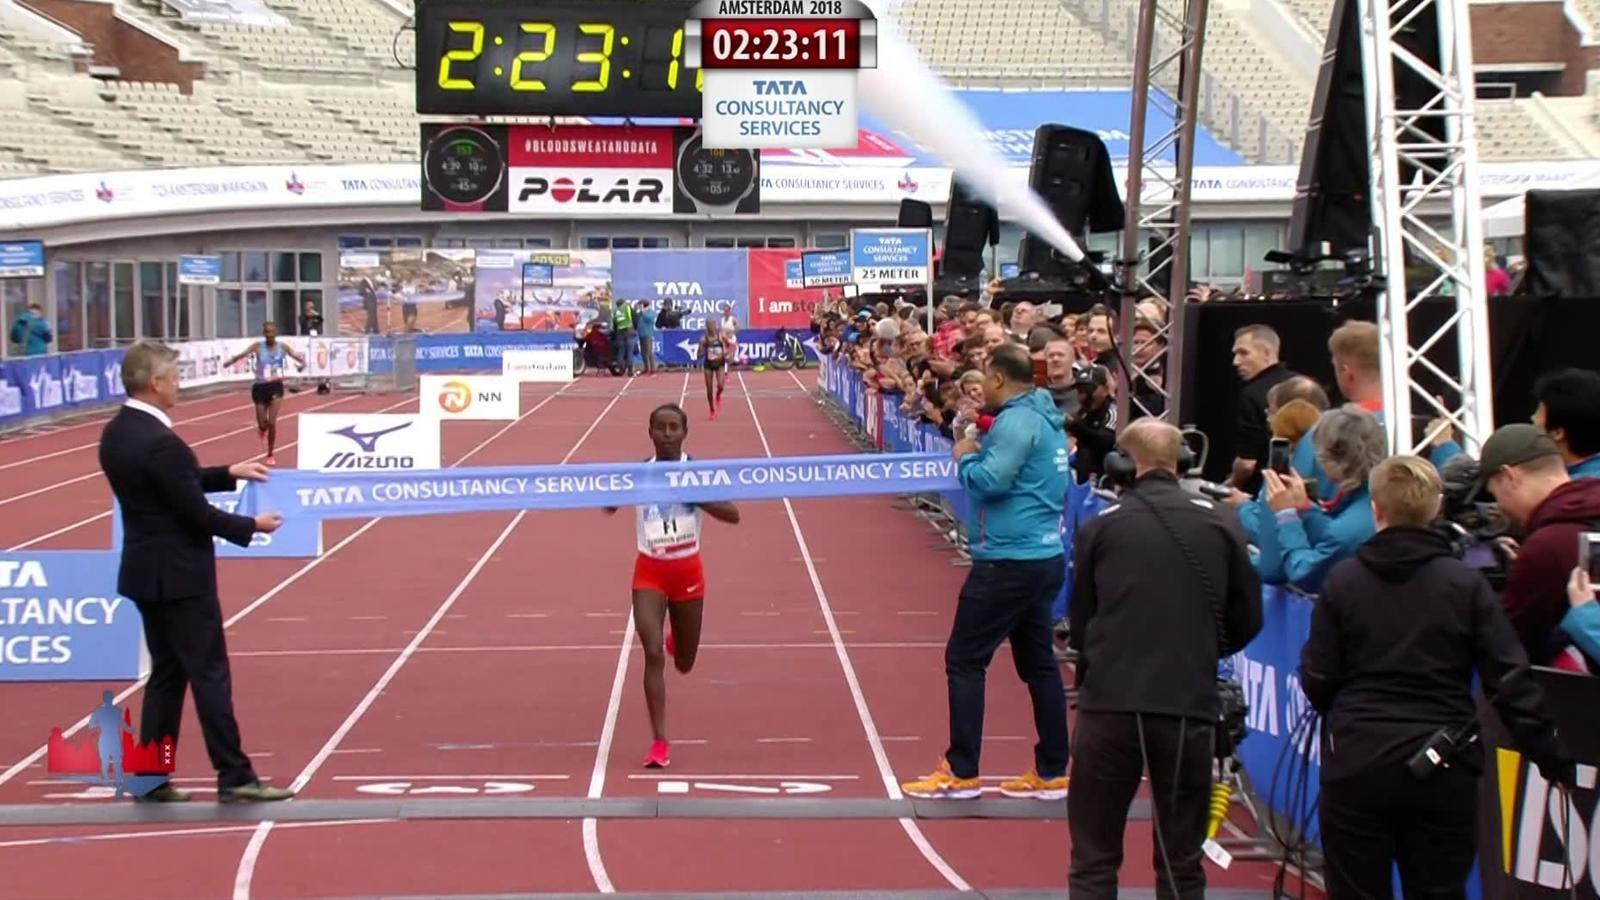 Tadelech Bekele won the women's Amsterdam marathon in in 2018. Like the men's champion, she also won in 2017